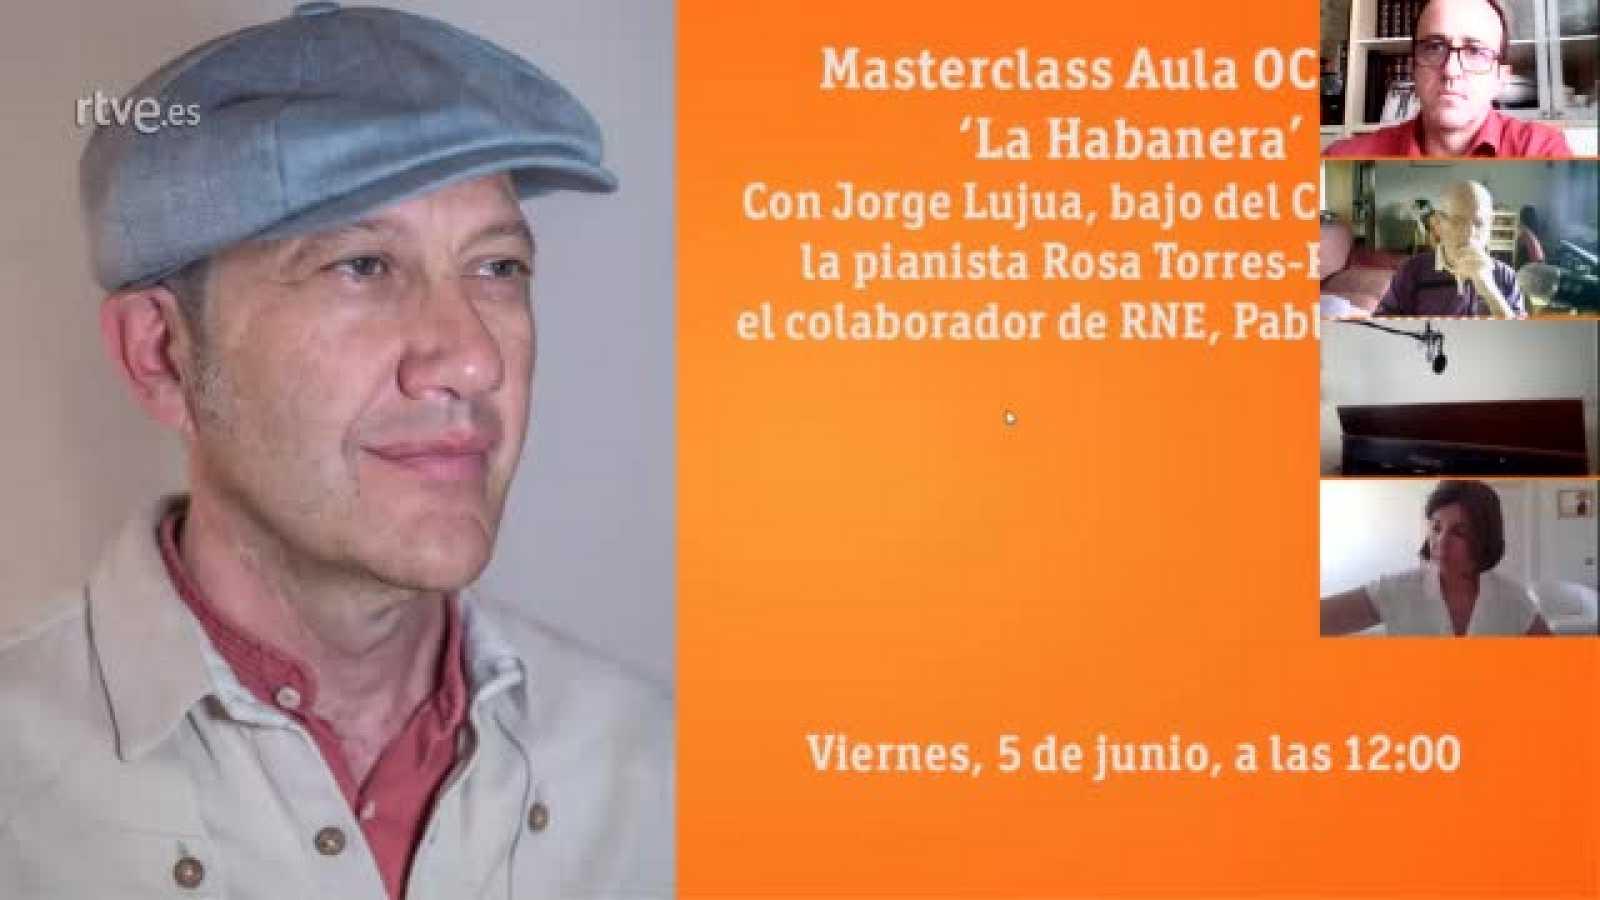 Masterclass Aula OCRTVE Jorge Lujua La habanera